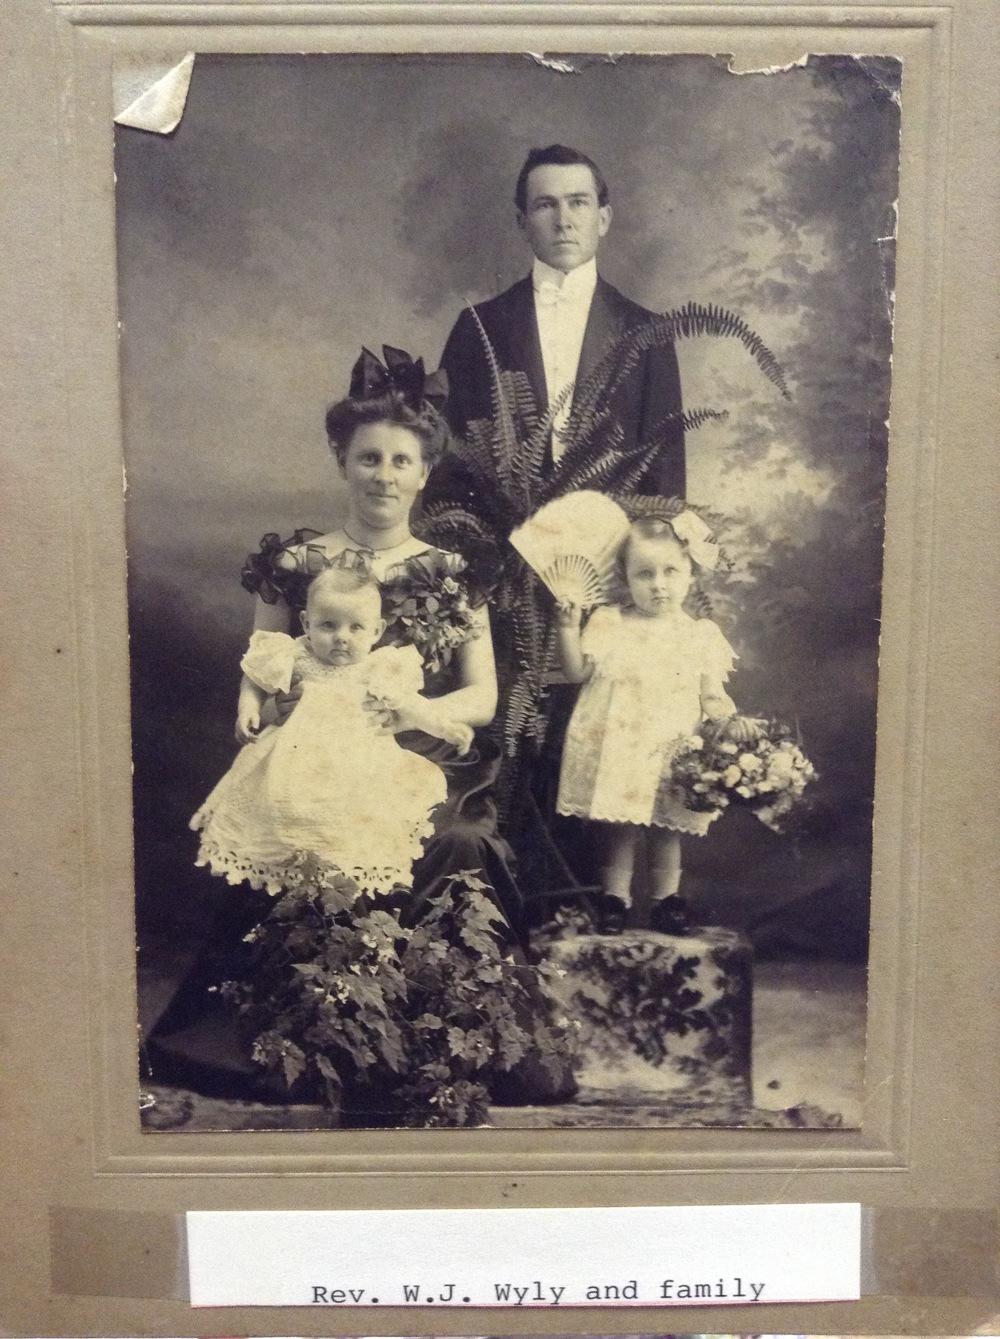 Rev. W.J. Wyly and Family